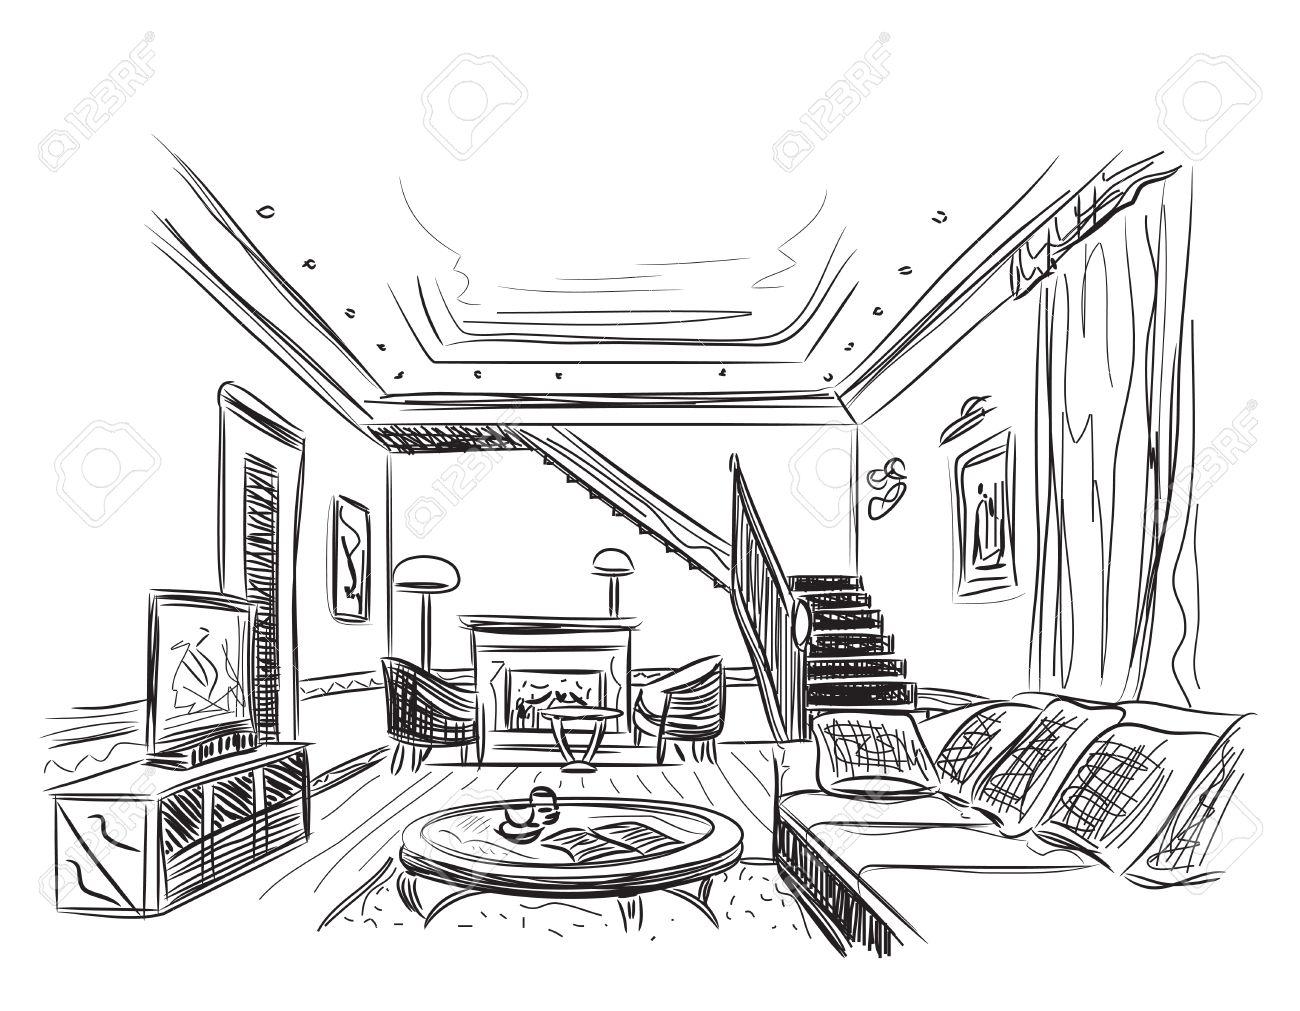 modern interior room sketch hand drawn illustration royalty free